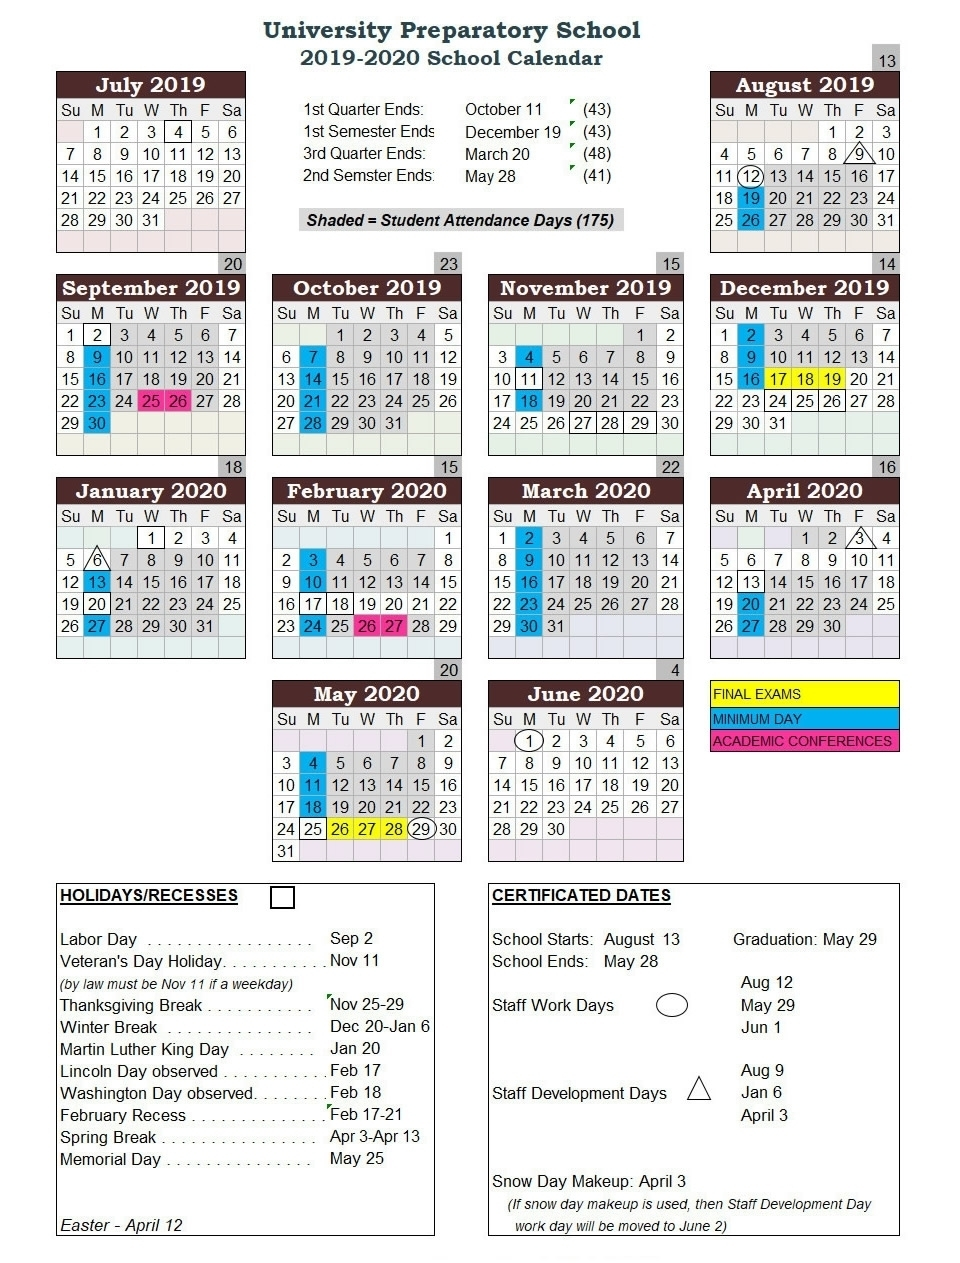 U Of M School Calendar 2020 | Calendar Design Ideas for U Of M Calendar 2019-2020 School Year